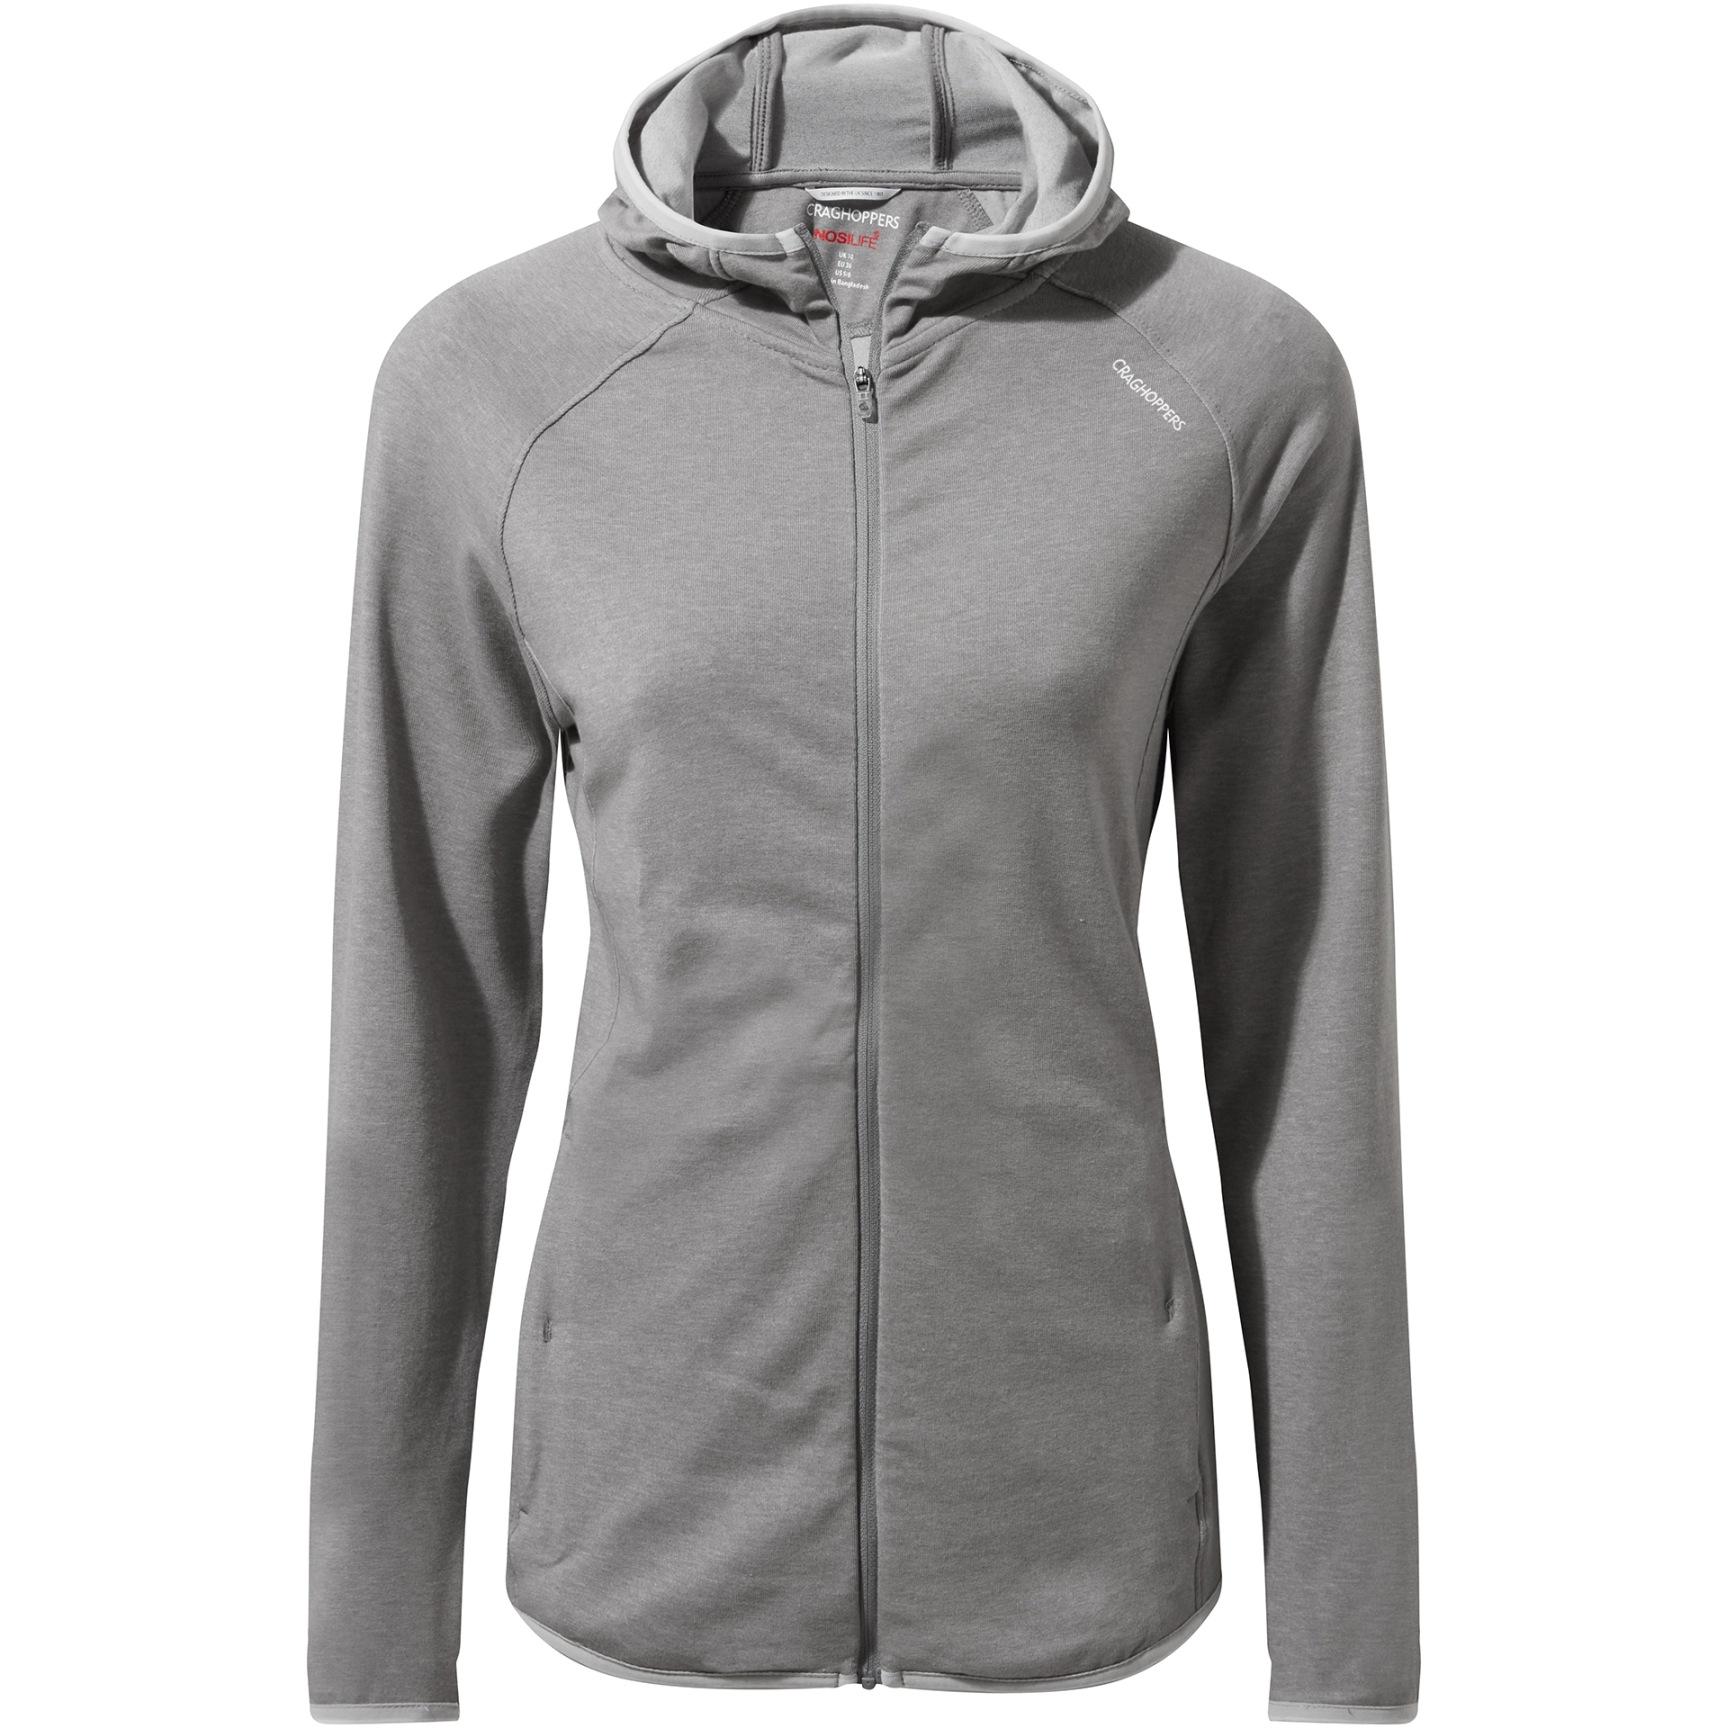 Craghoppers NosiLife Nilo Women's Hooded Jacket - soft grey marl